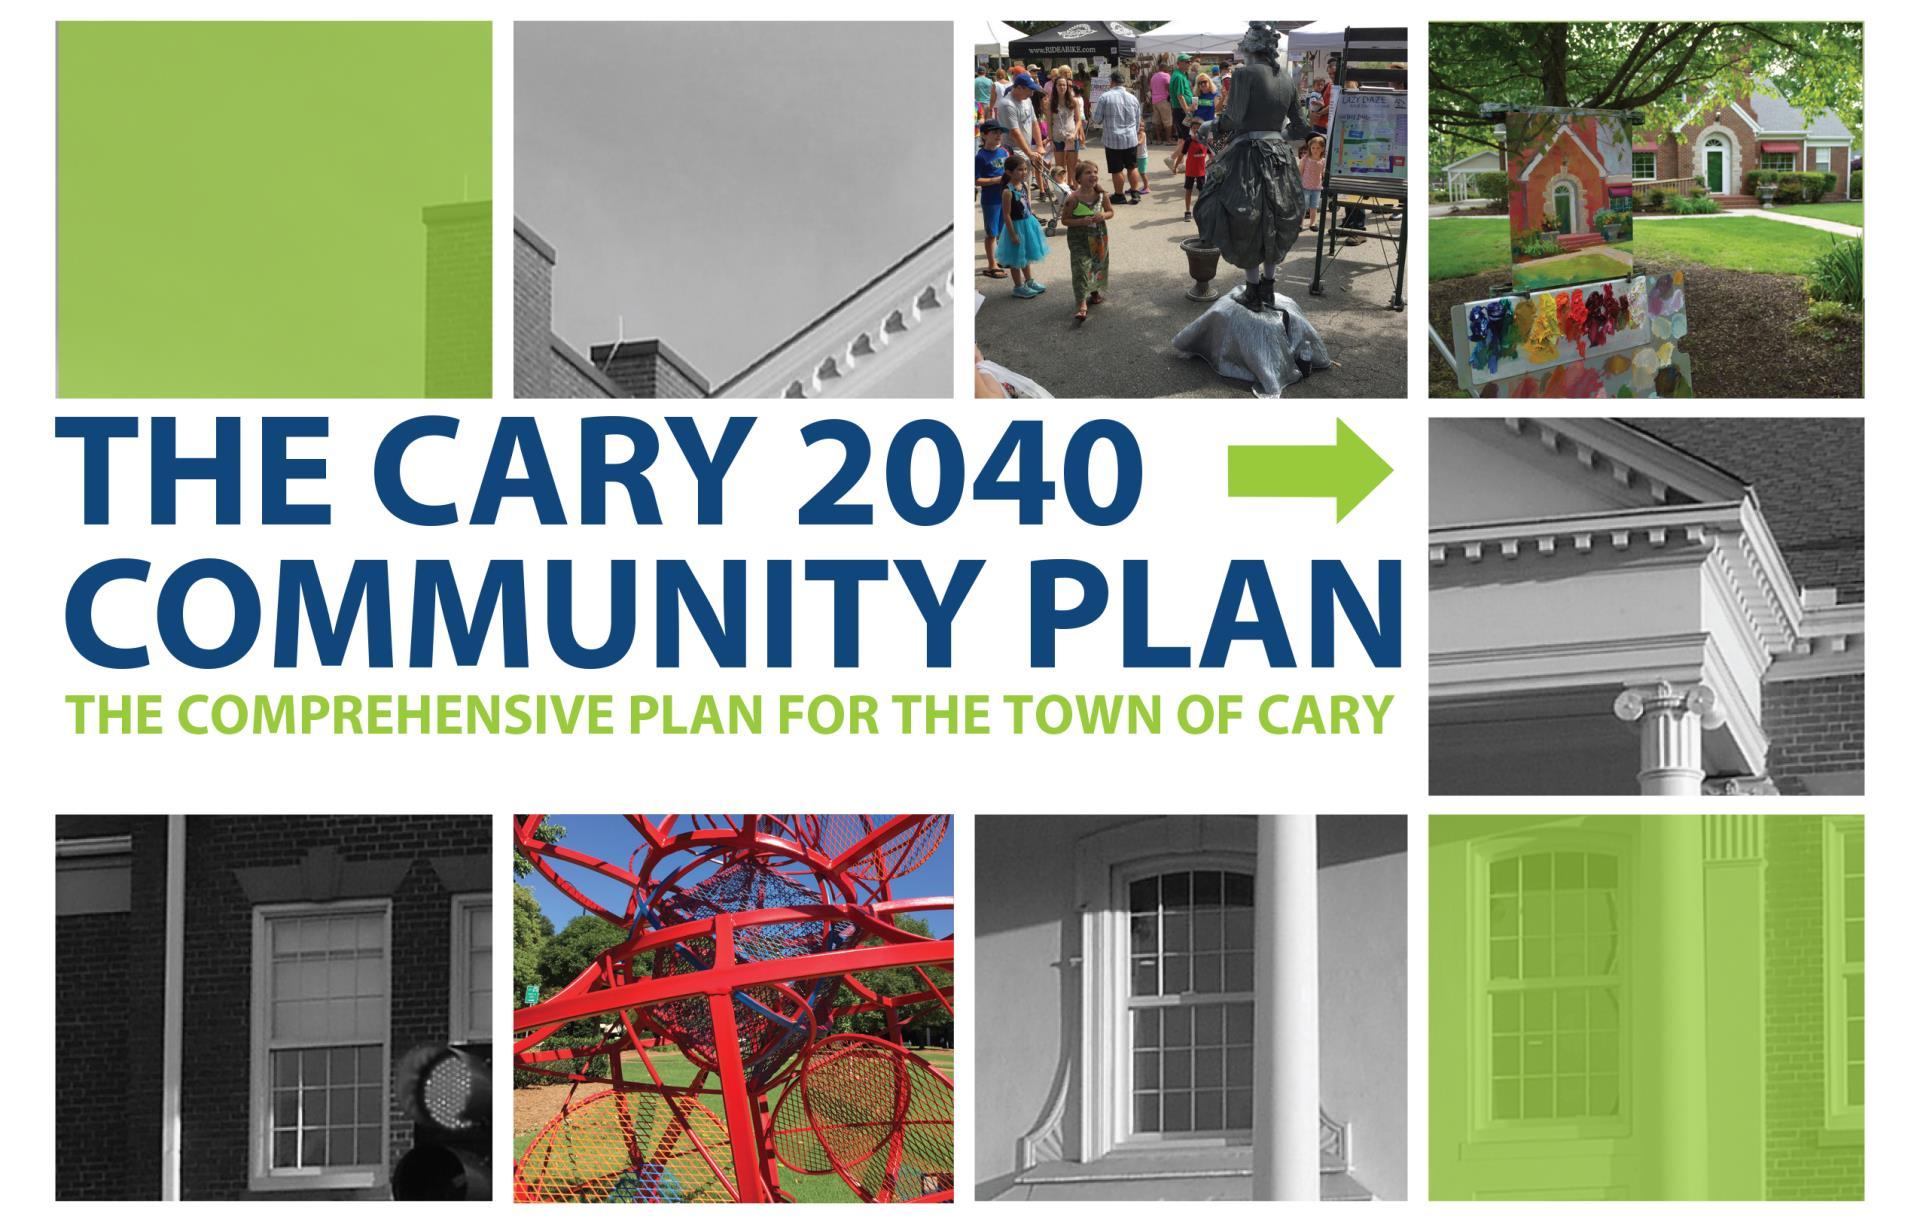 Cary Community Plan